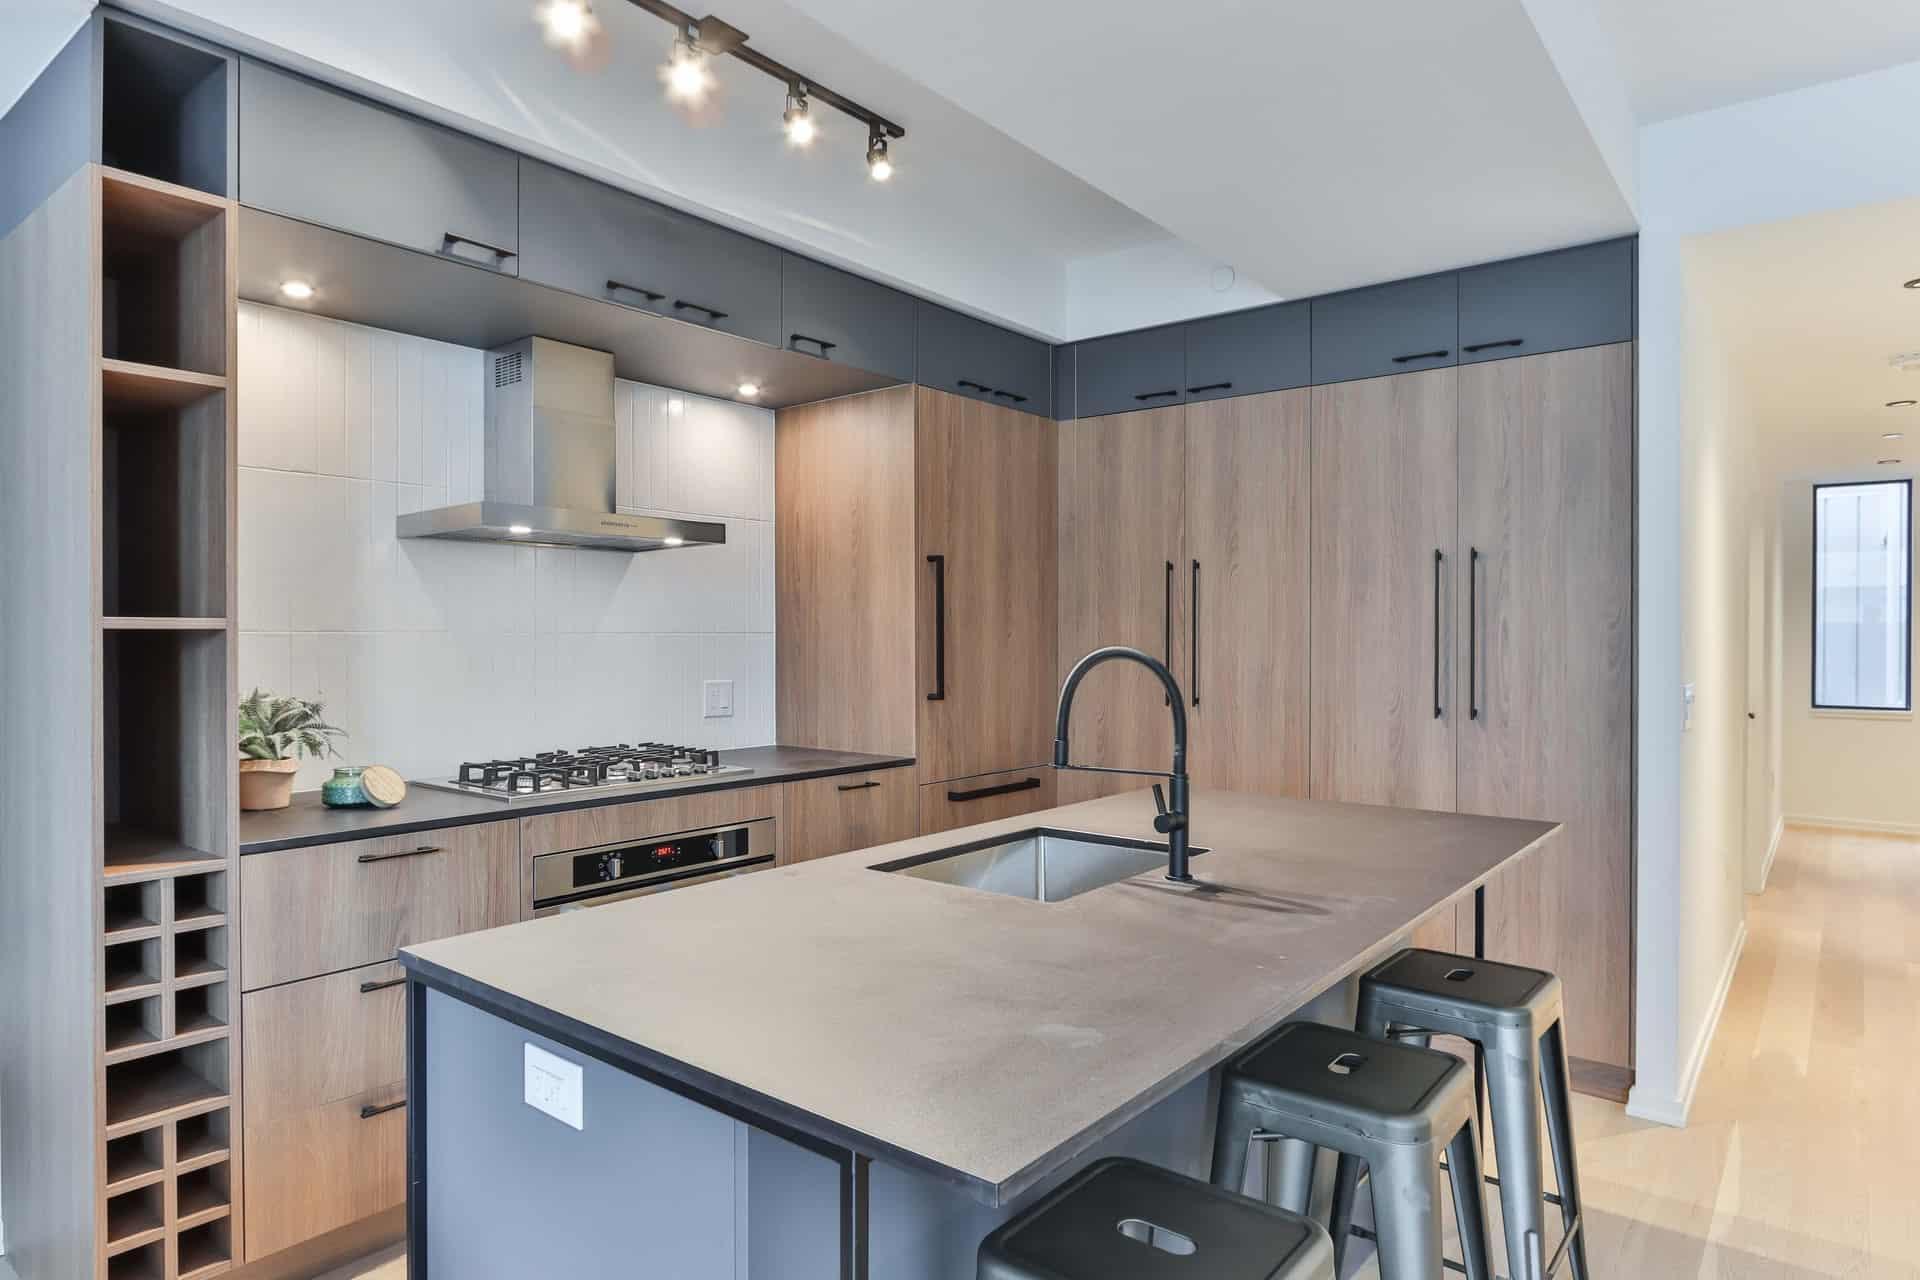 kohler kitchen faucet in a modern wood-style kitchen